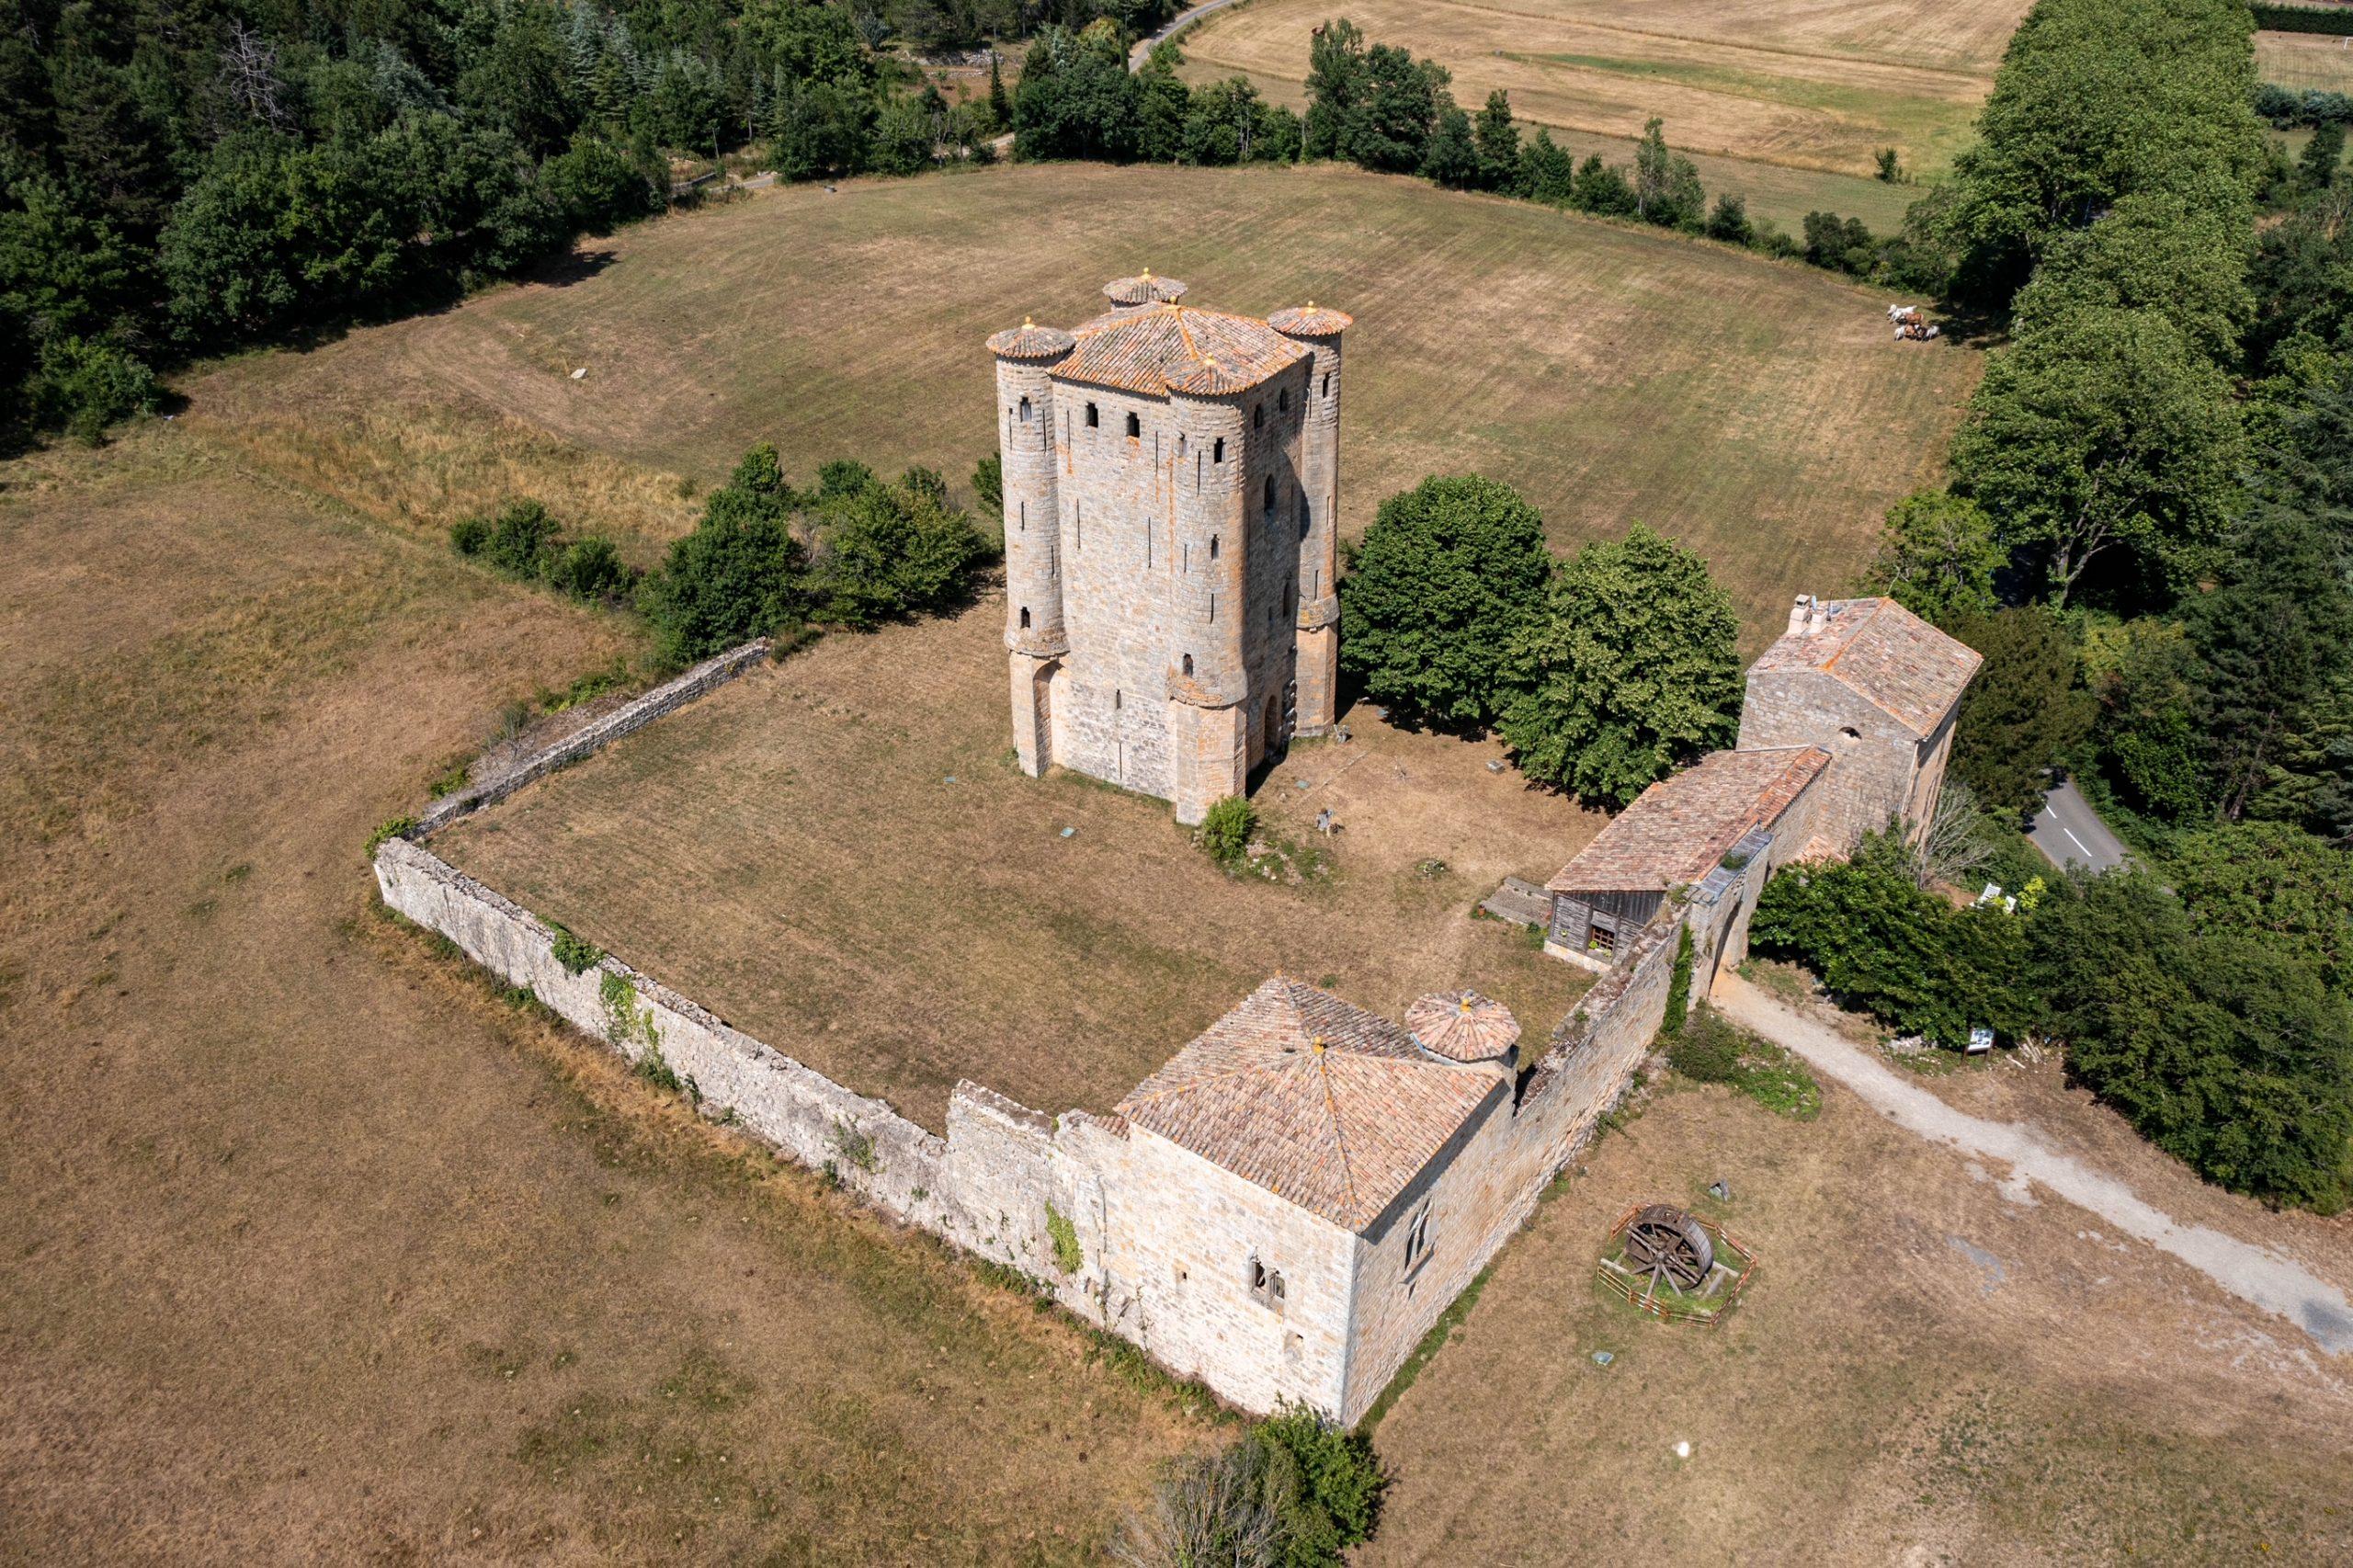 château d'arques drone